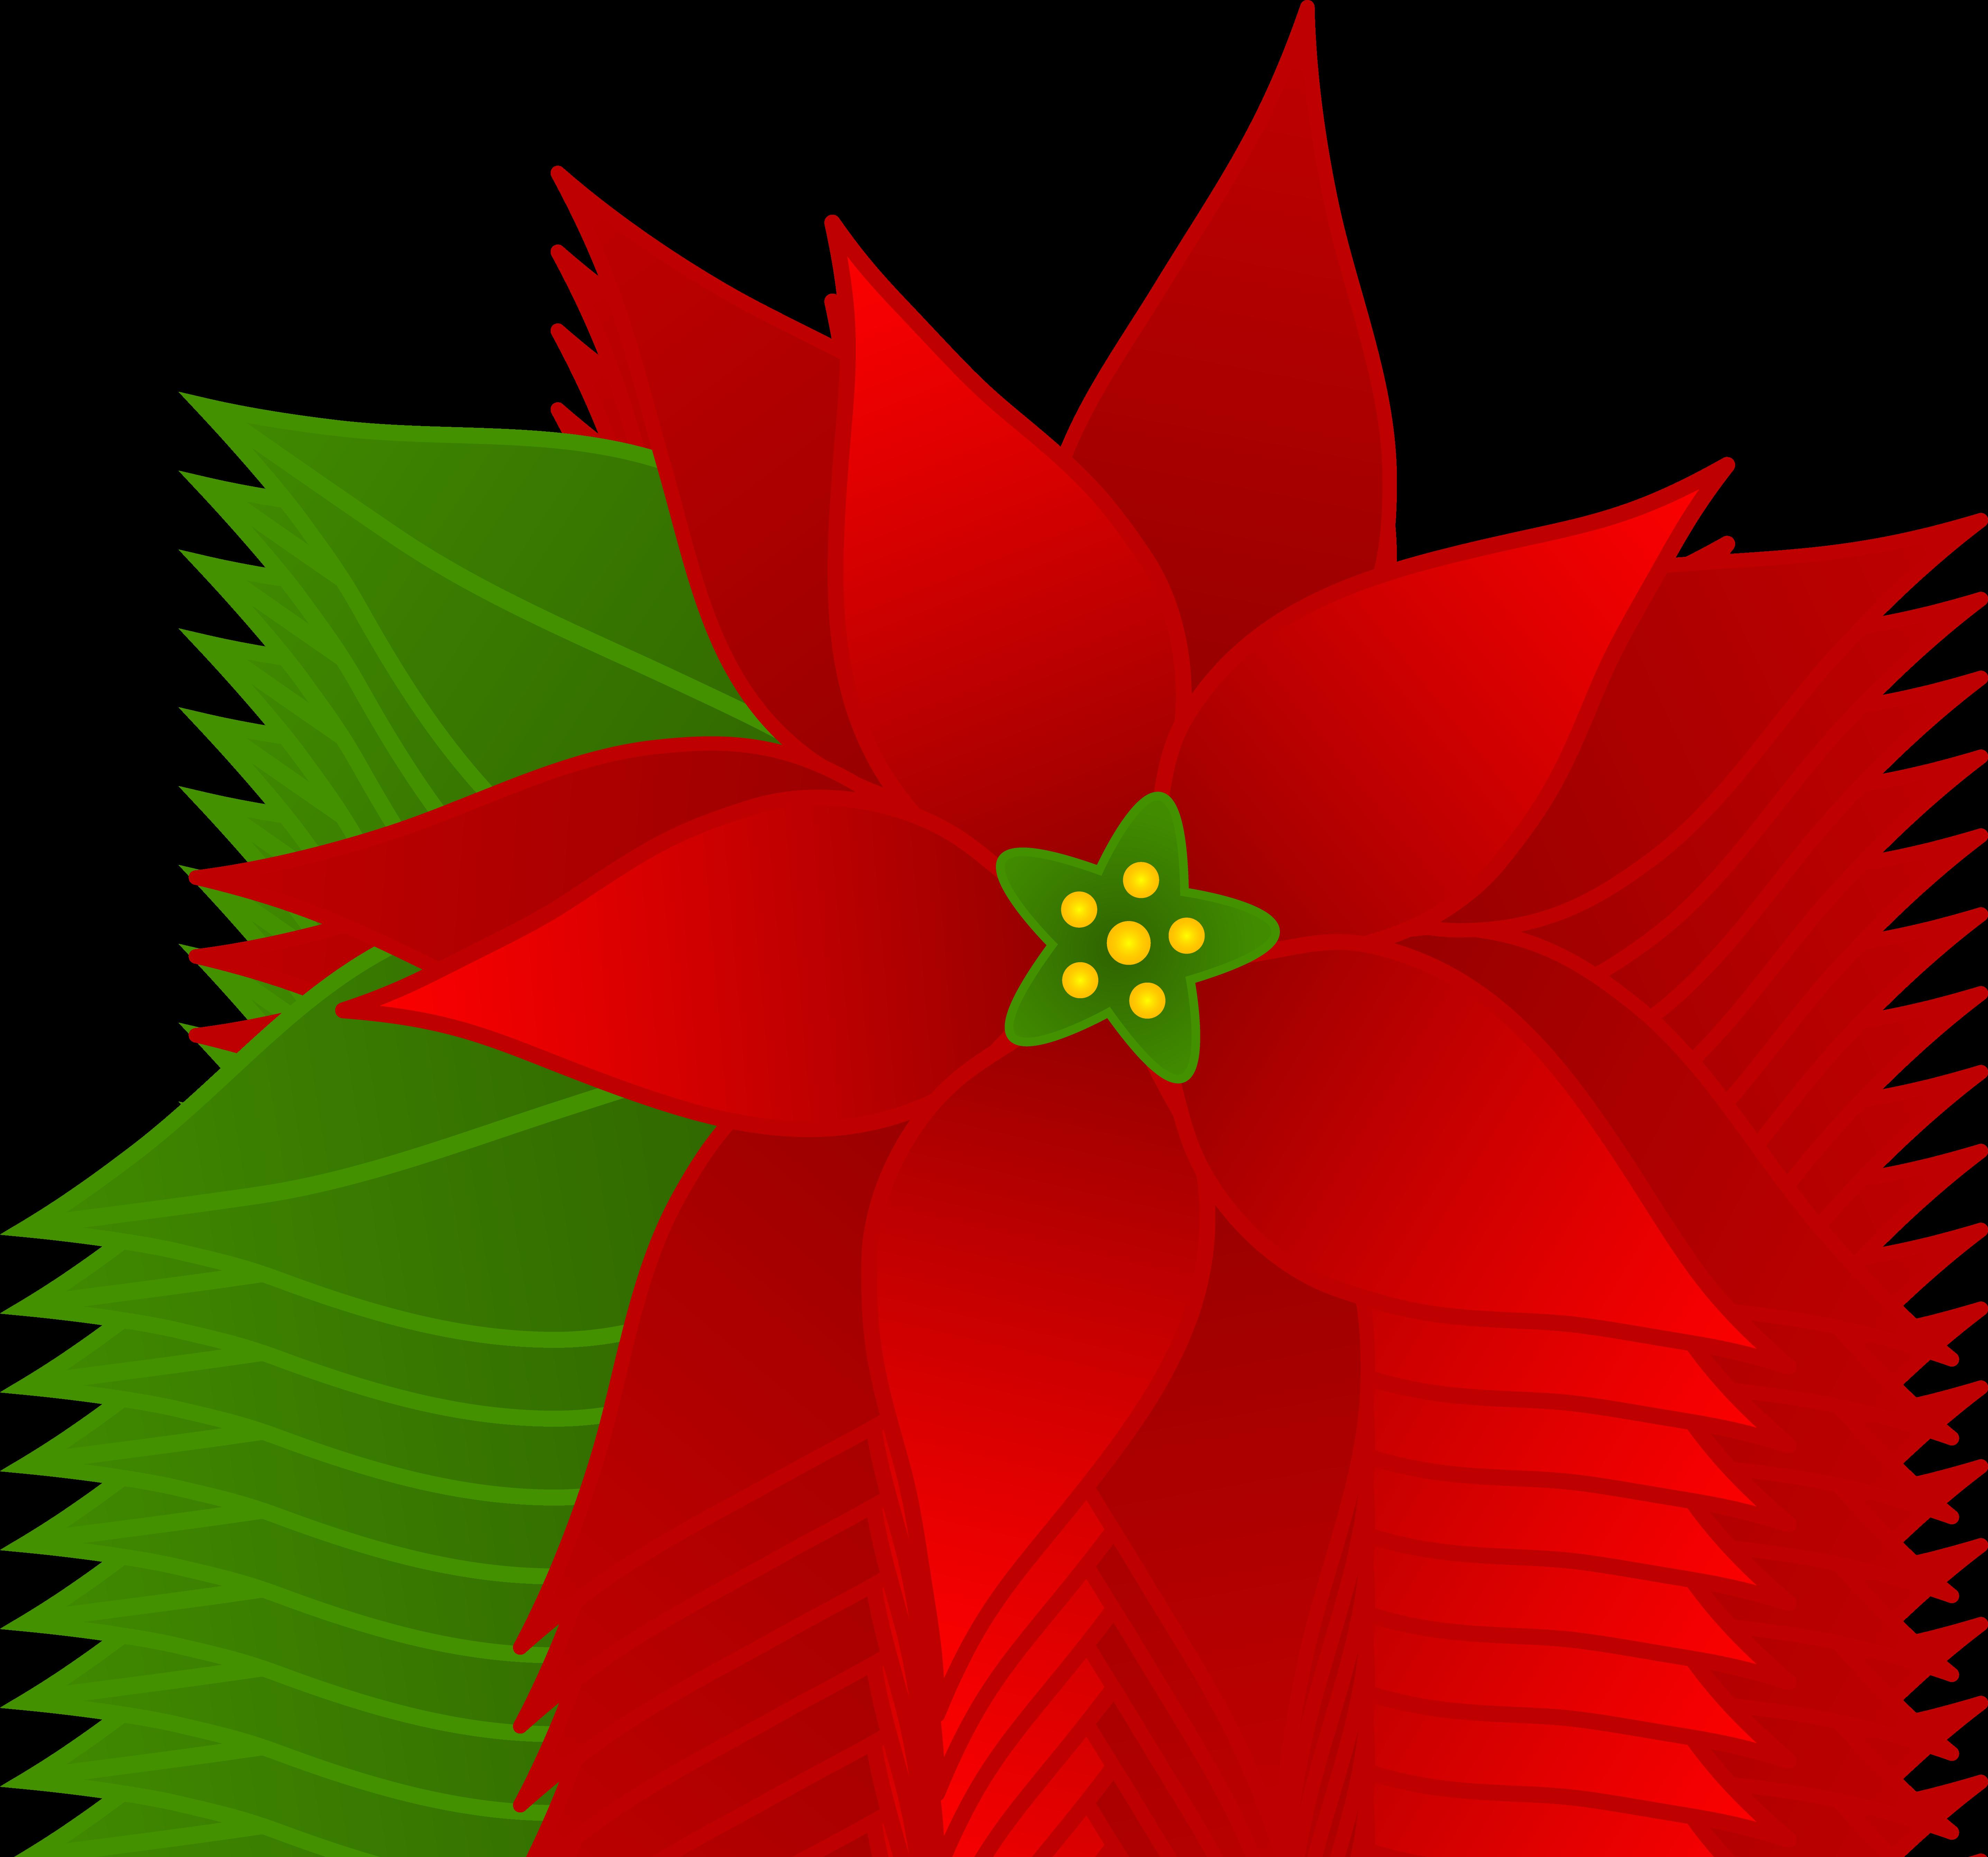 Poinsettia cliparts